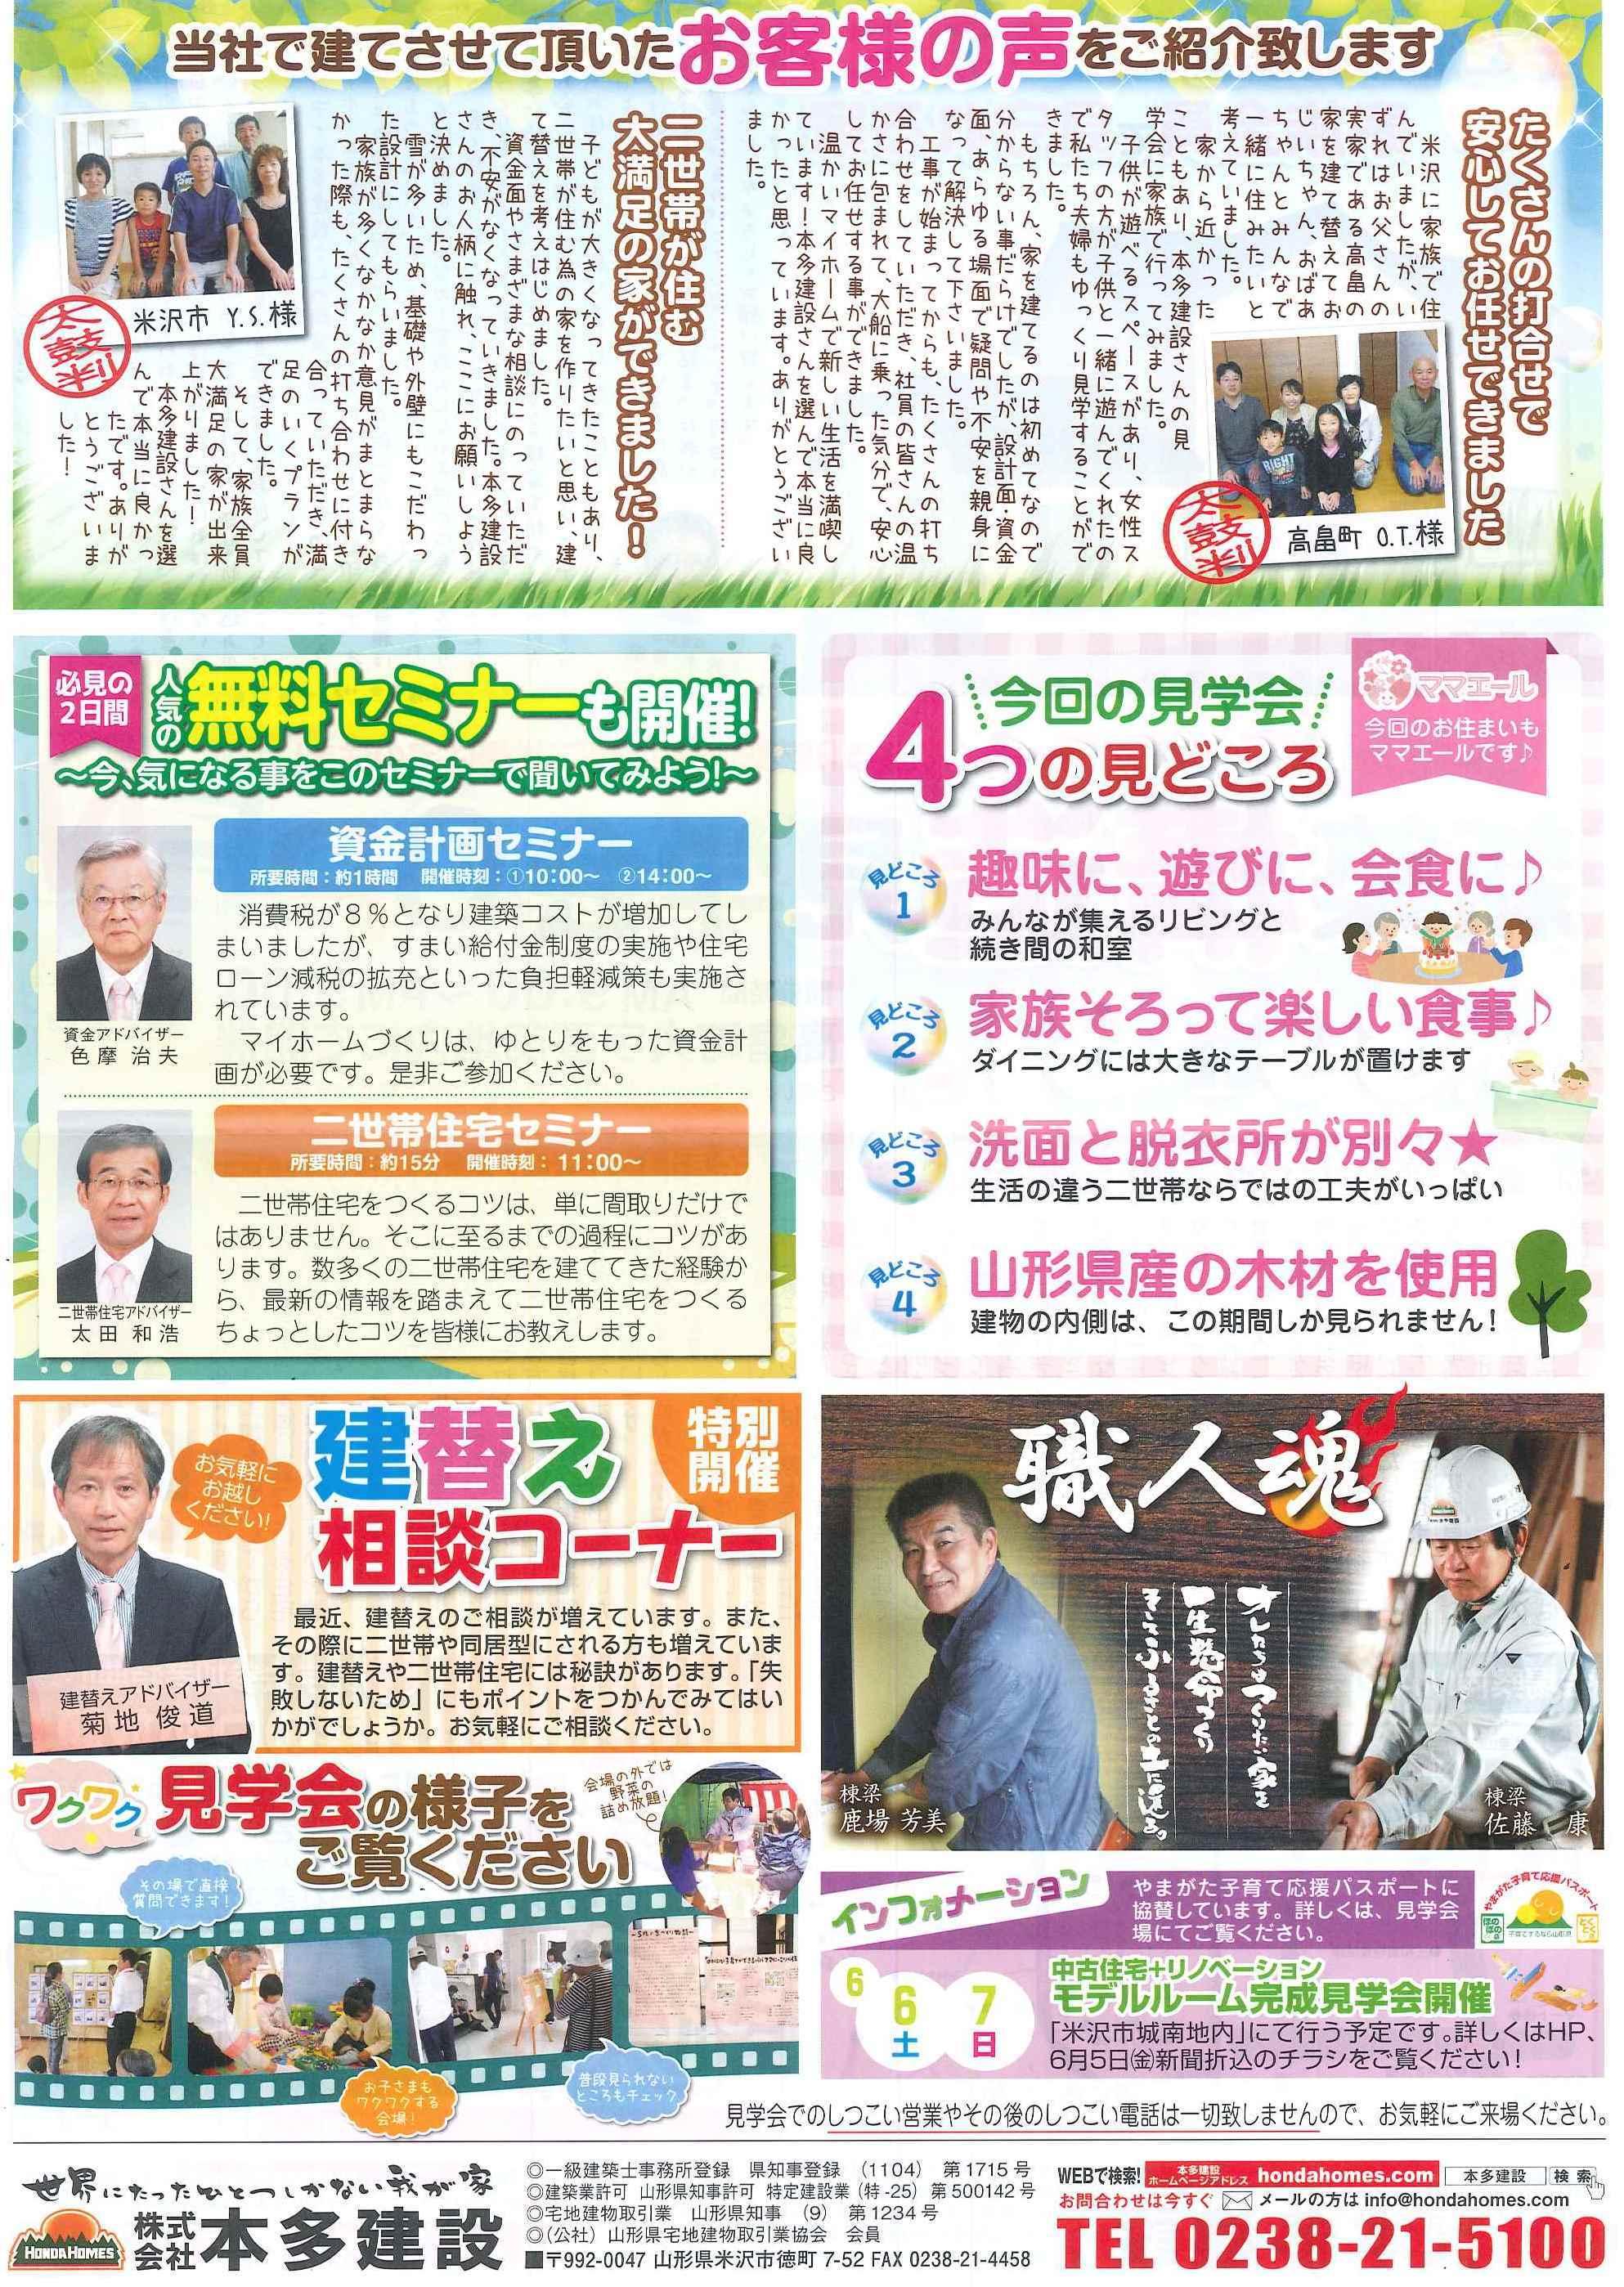 https://lixil-reformshop.jp/shop/SP00000487/20150527163549111_0001.jpg